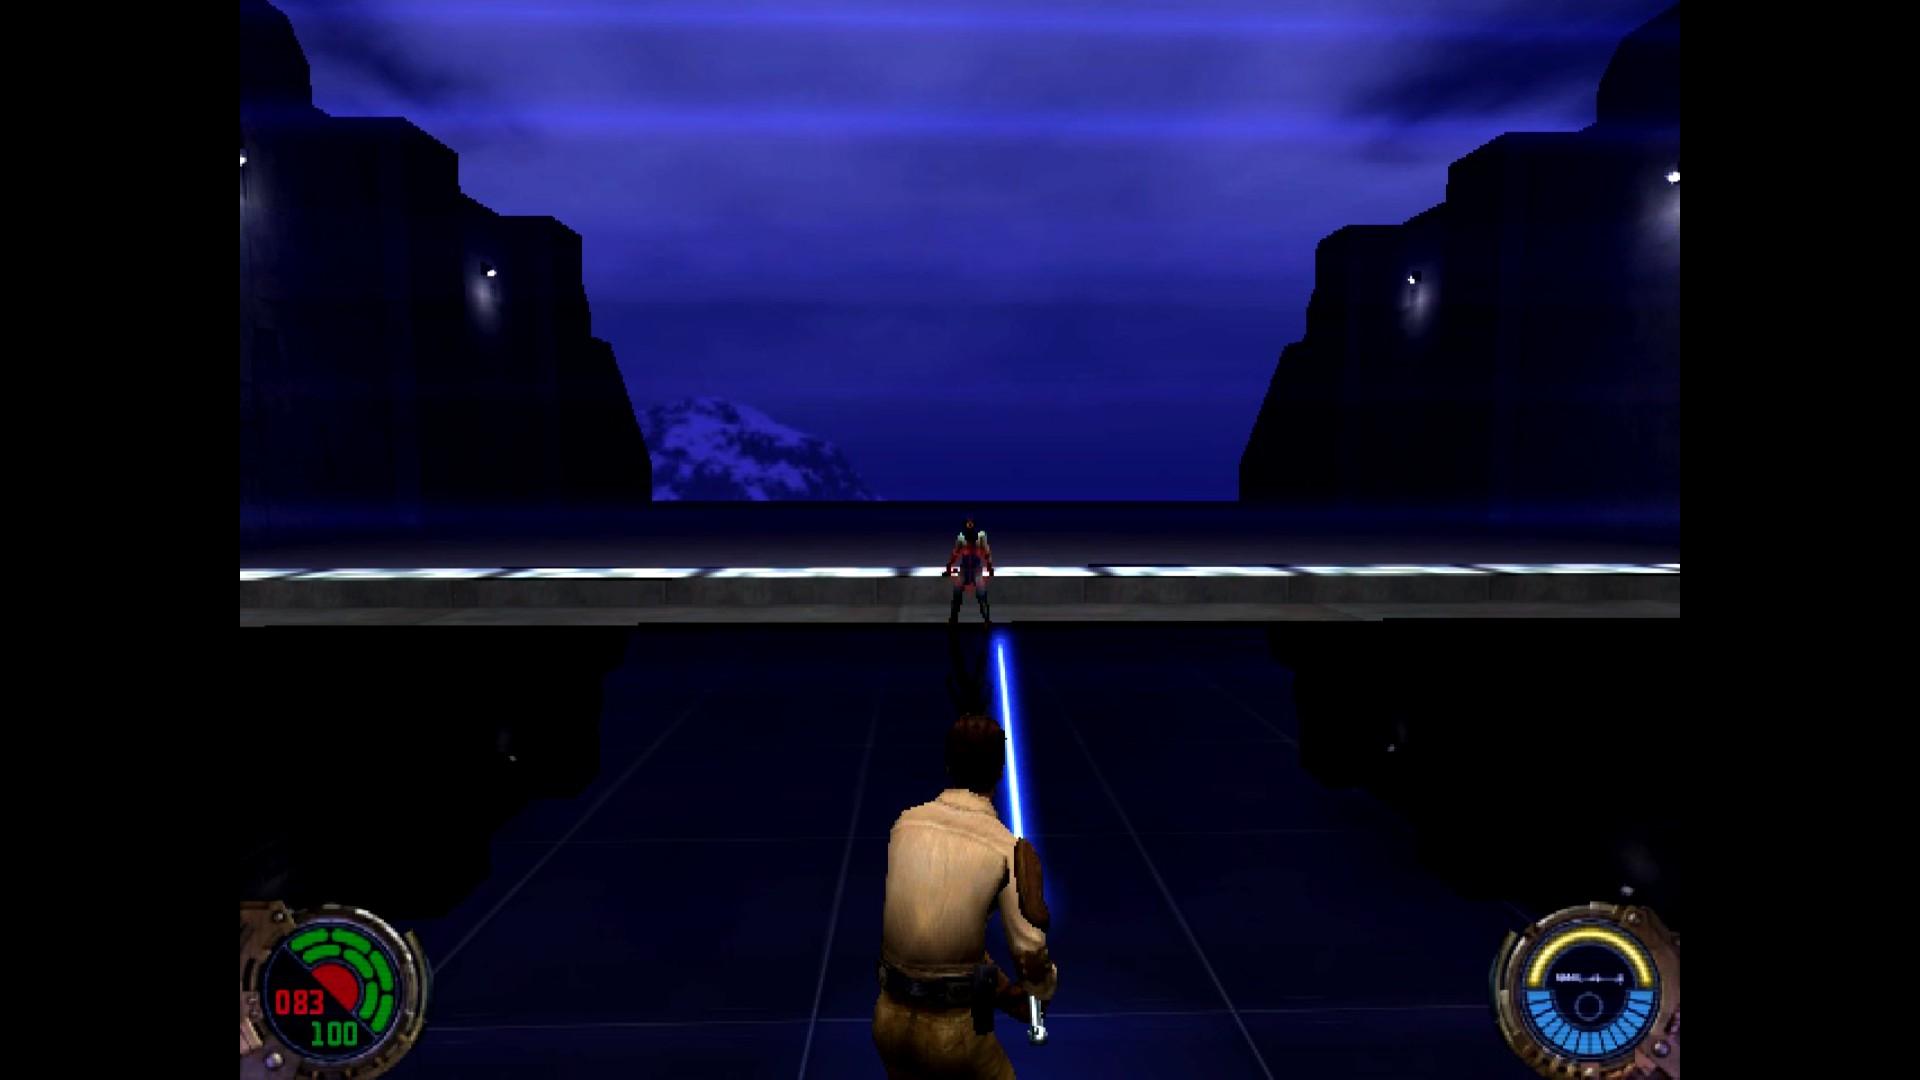 Jedi Outcast Is Still a Legendary Star Wars Experience